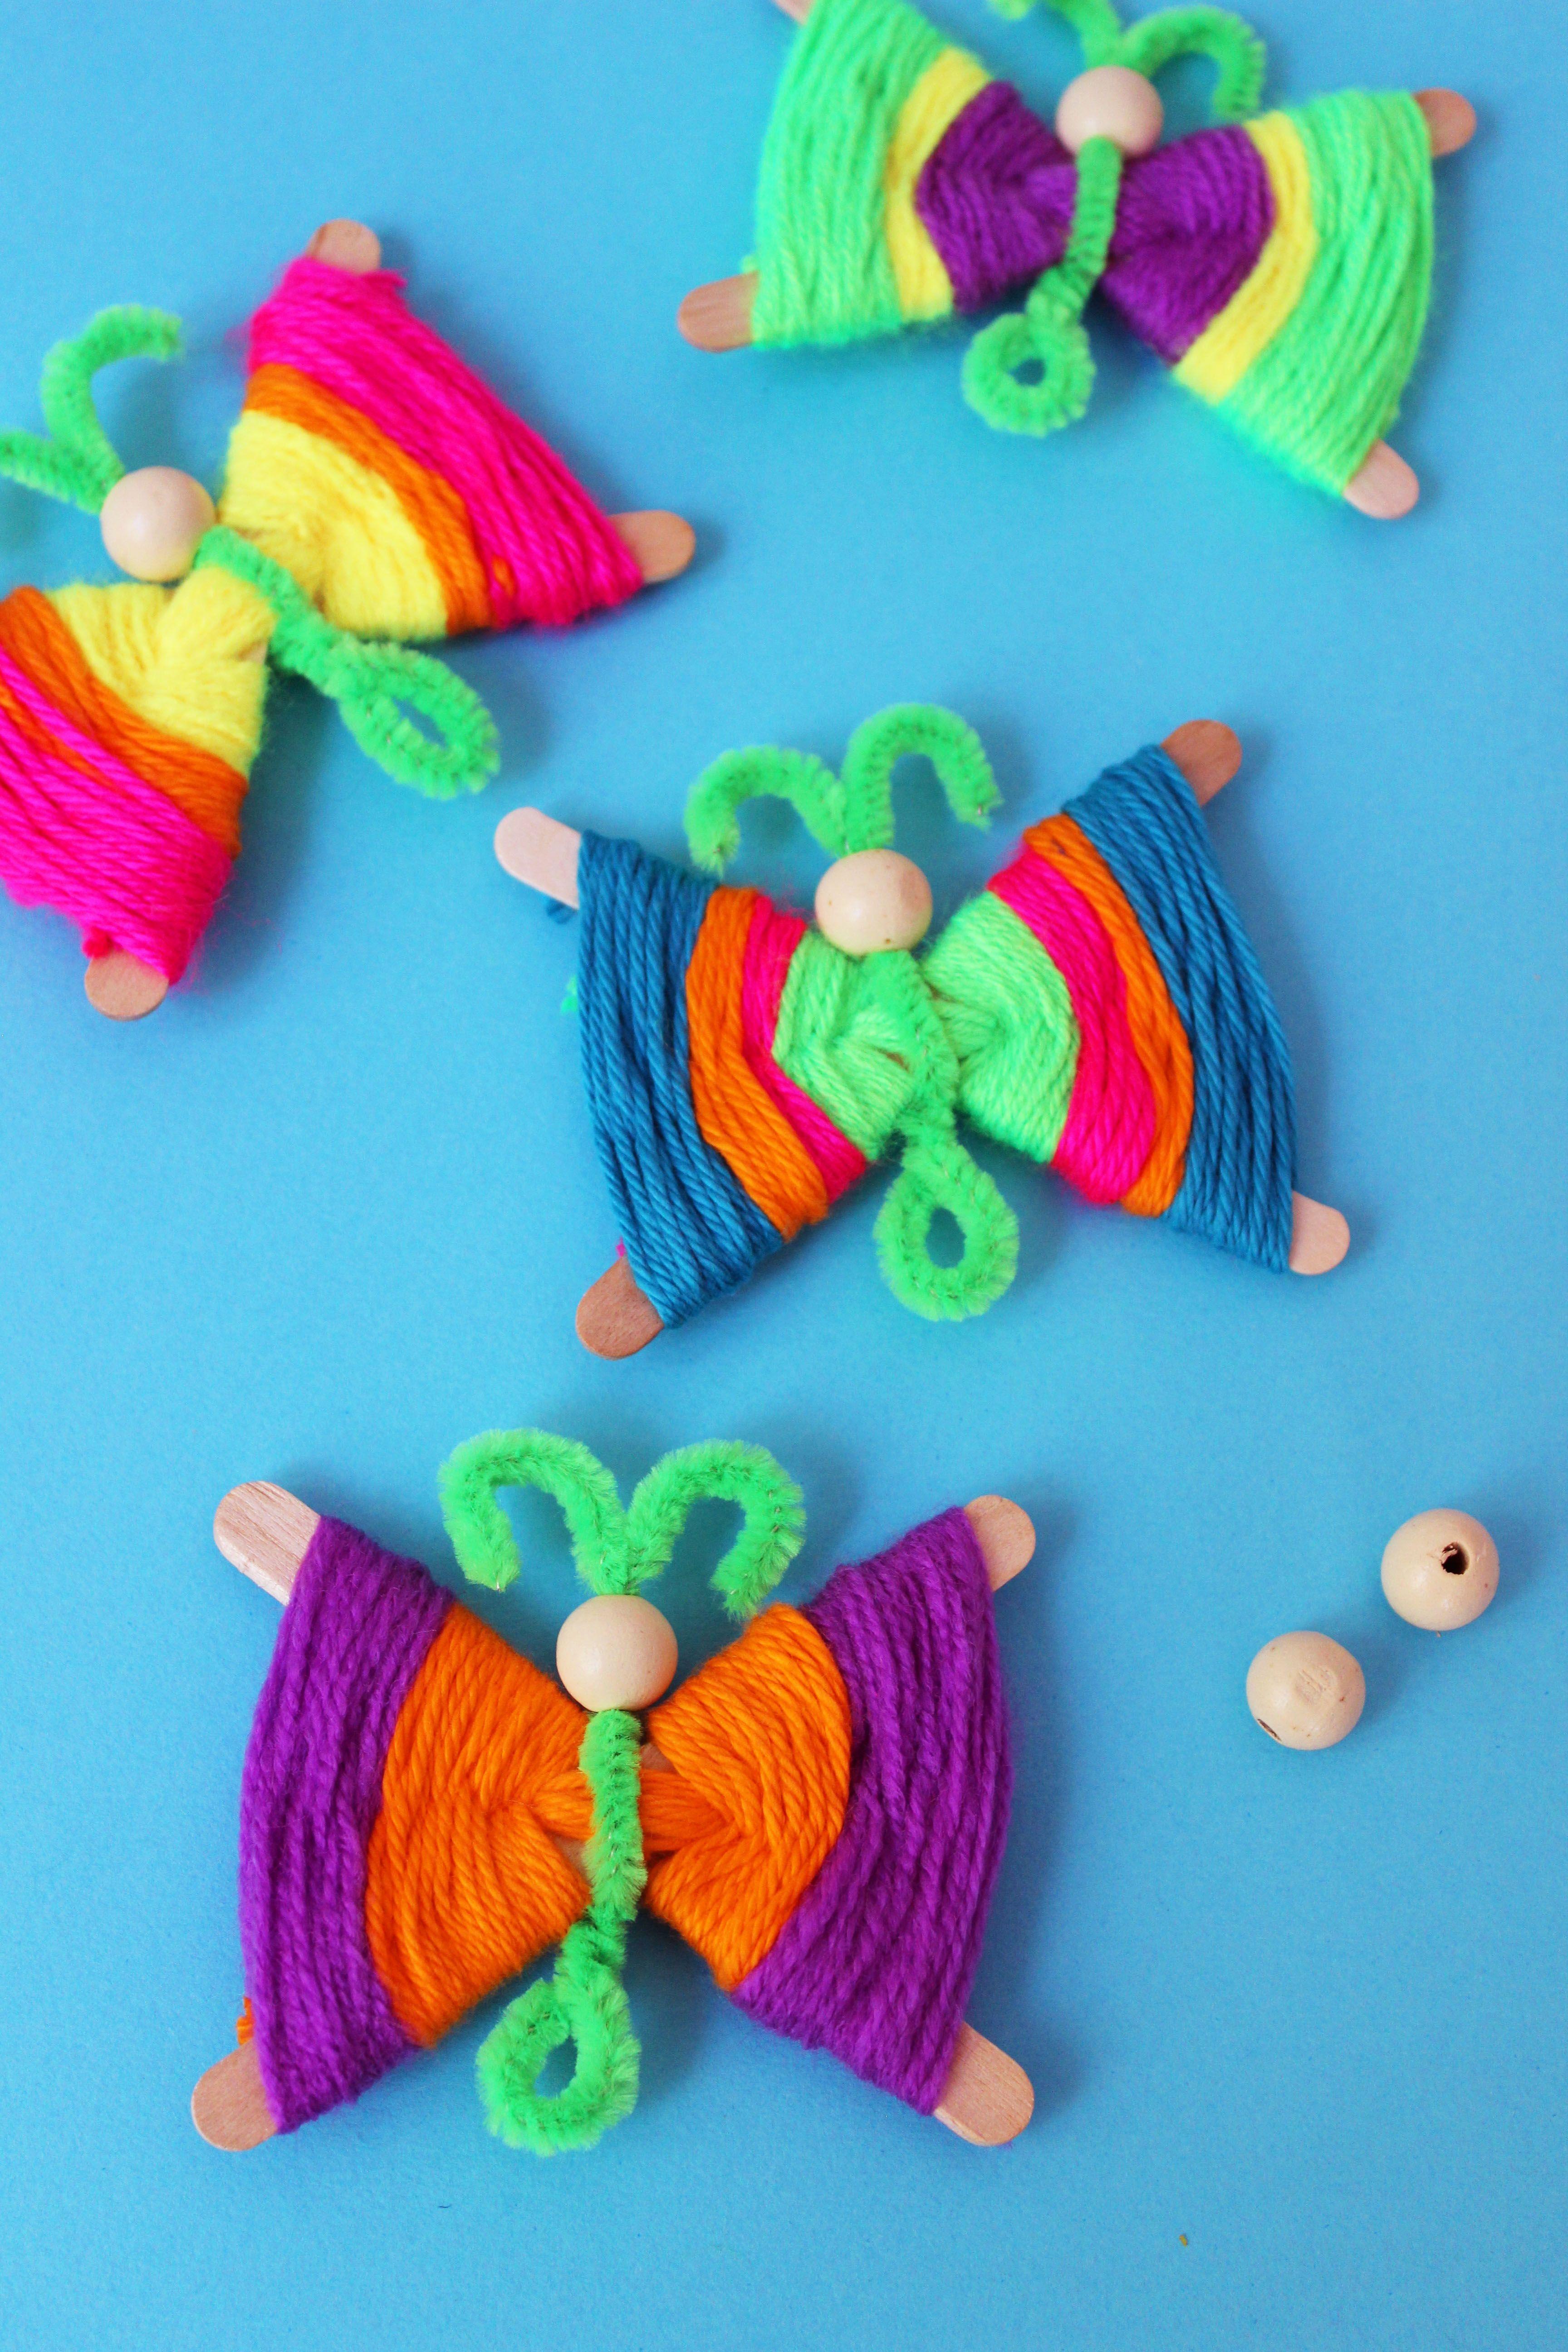 Popsicle Stick Kids Crafts Yarn Crafts For Kids Butterfly